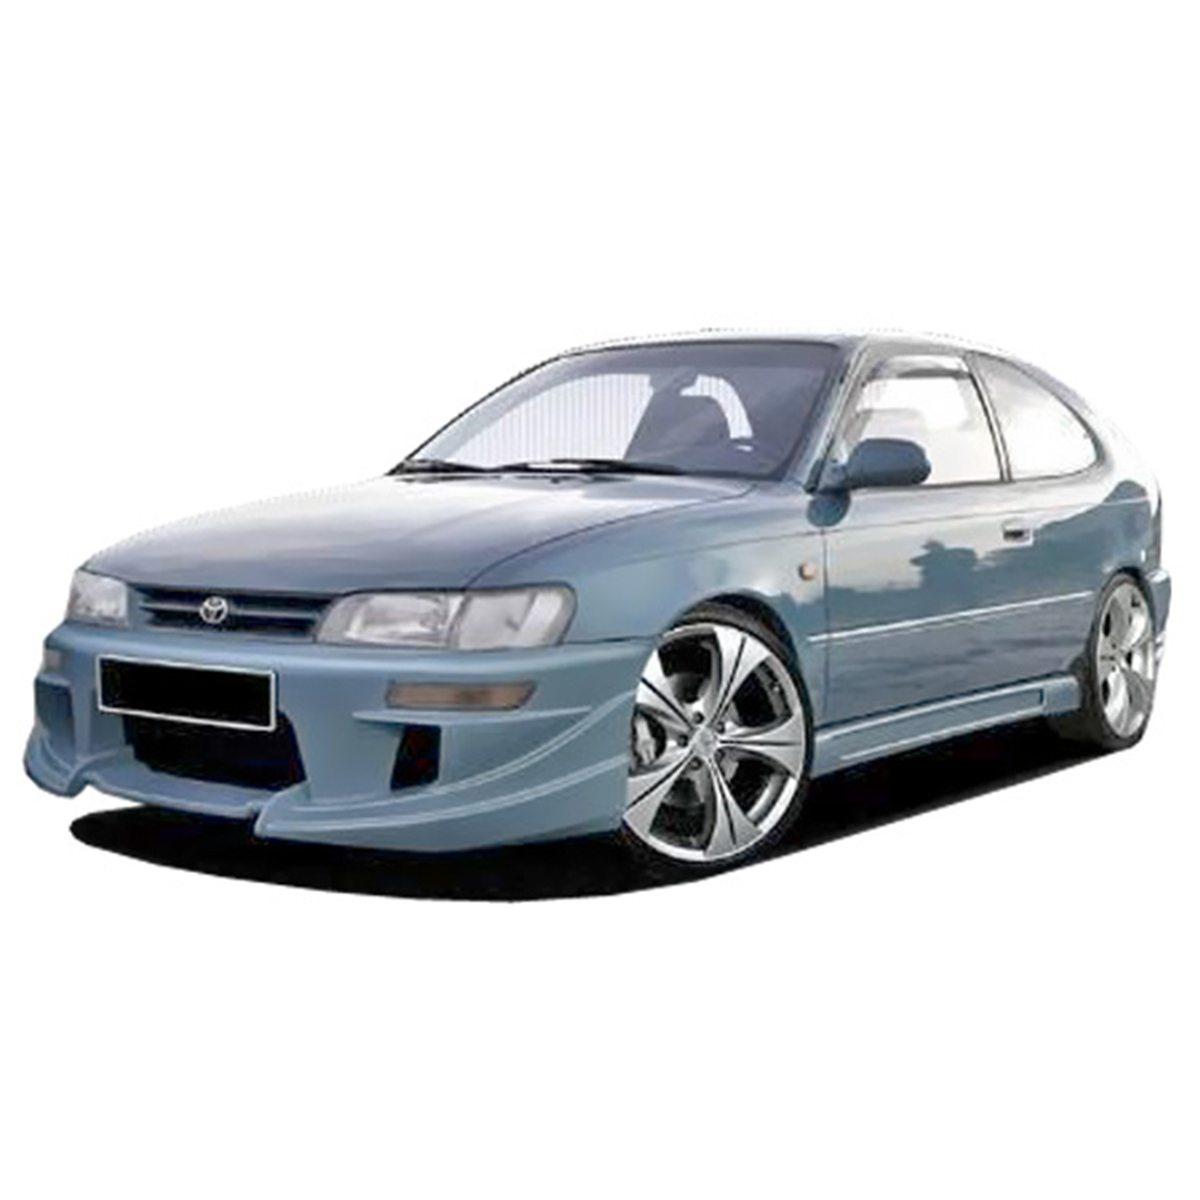 Toyota-Corolla-E10-LKA-Frt-PCS213